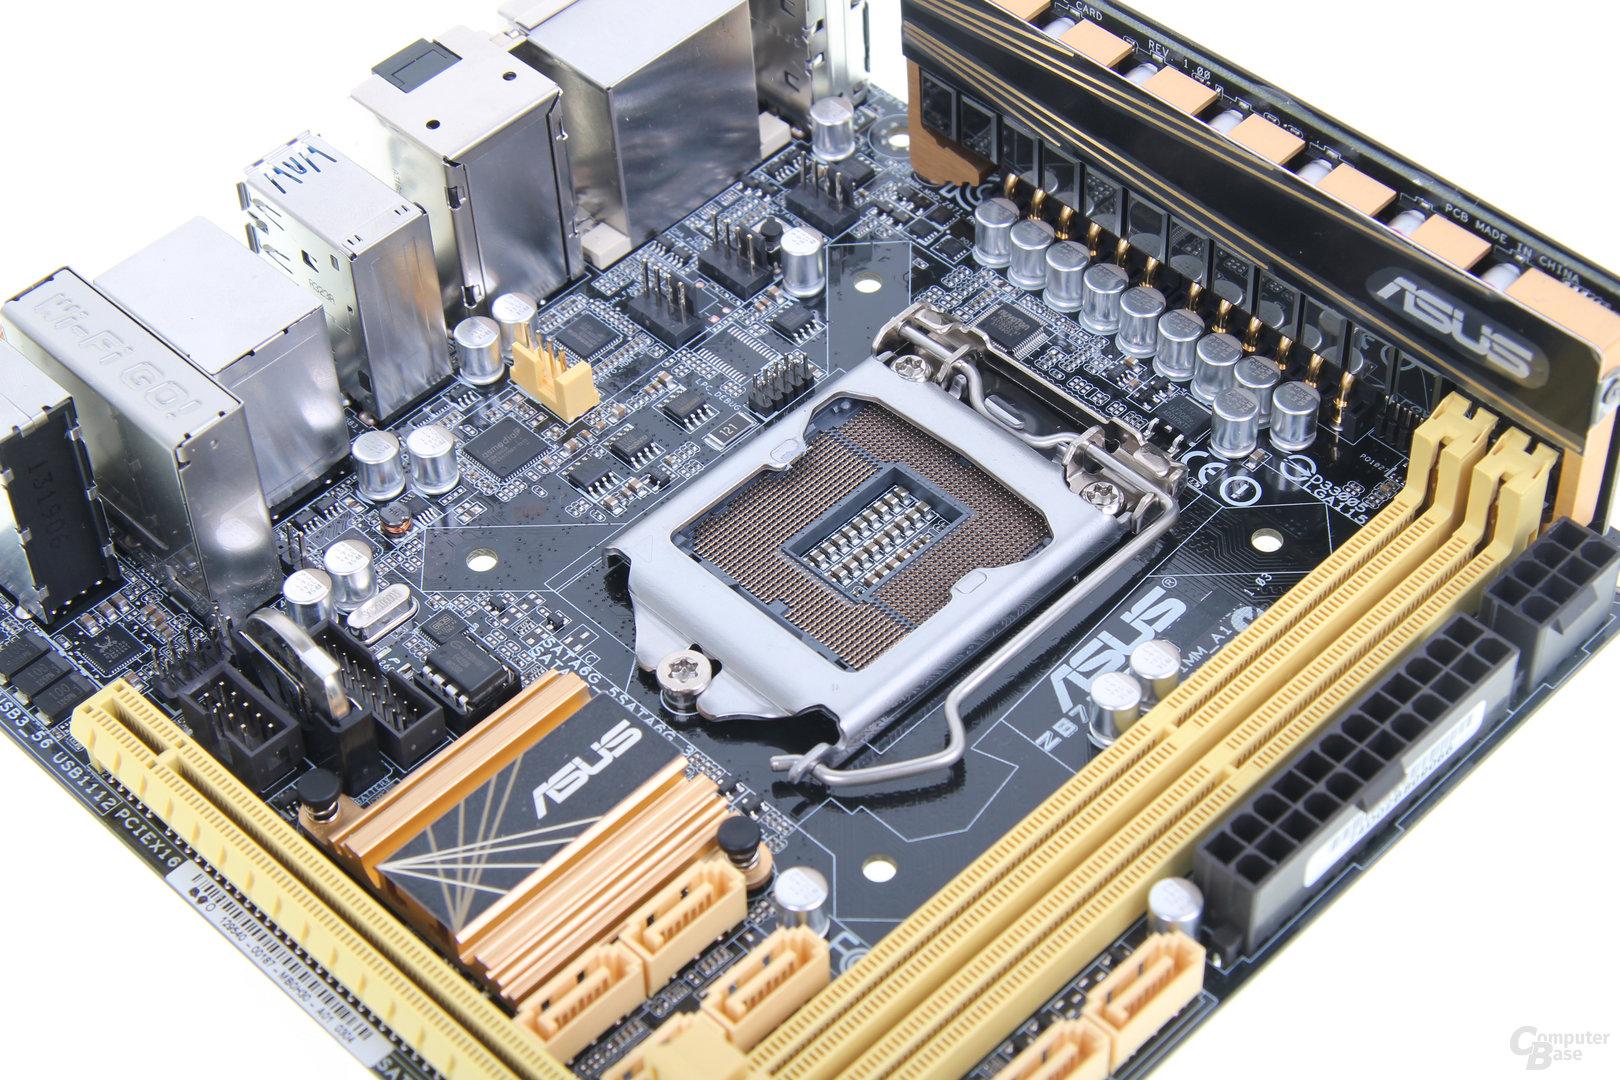 Asus Z87I-Pro - PCB